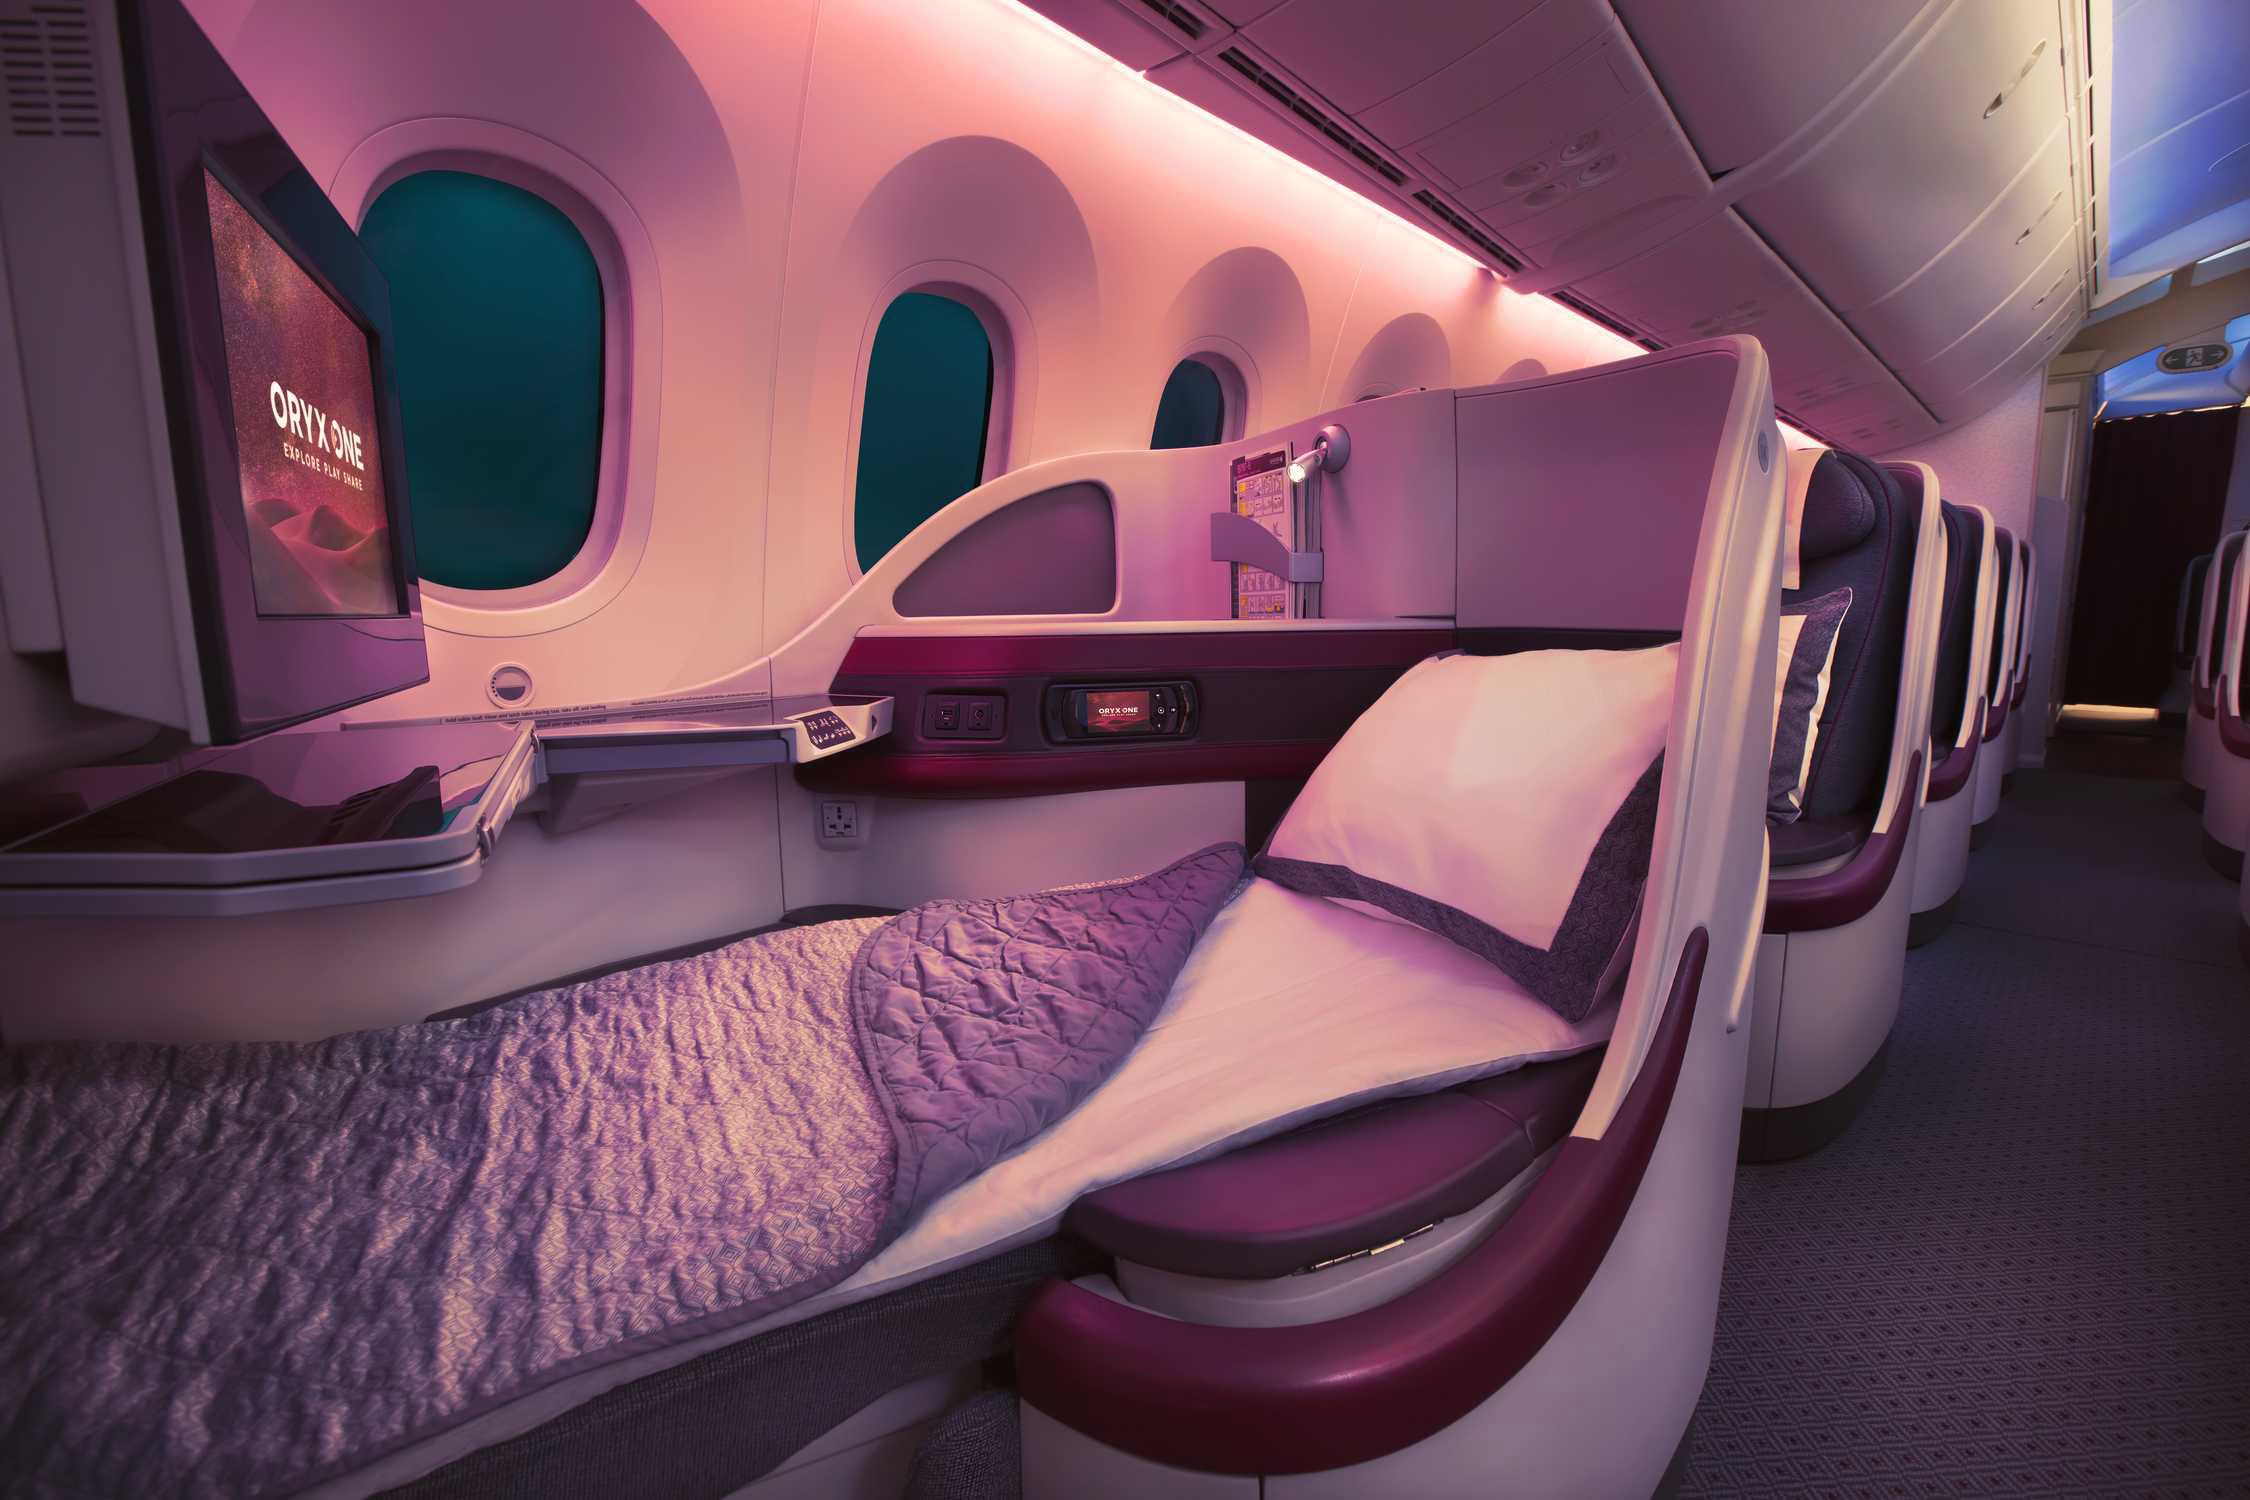 Qatar Airways postpones plan to make Singapore an all-Qsuite route